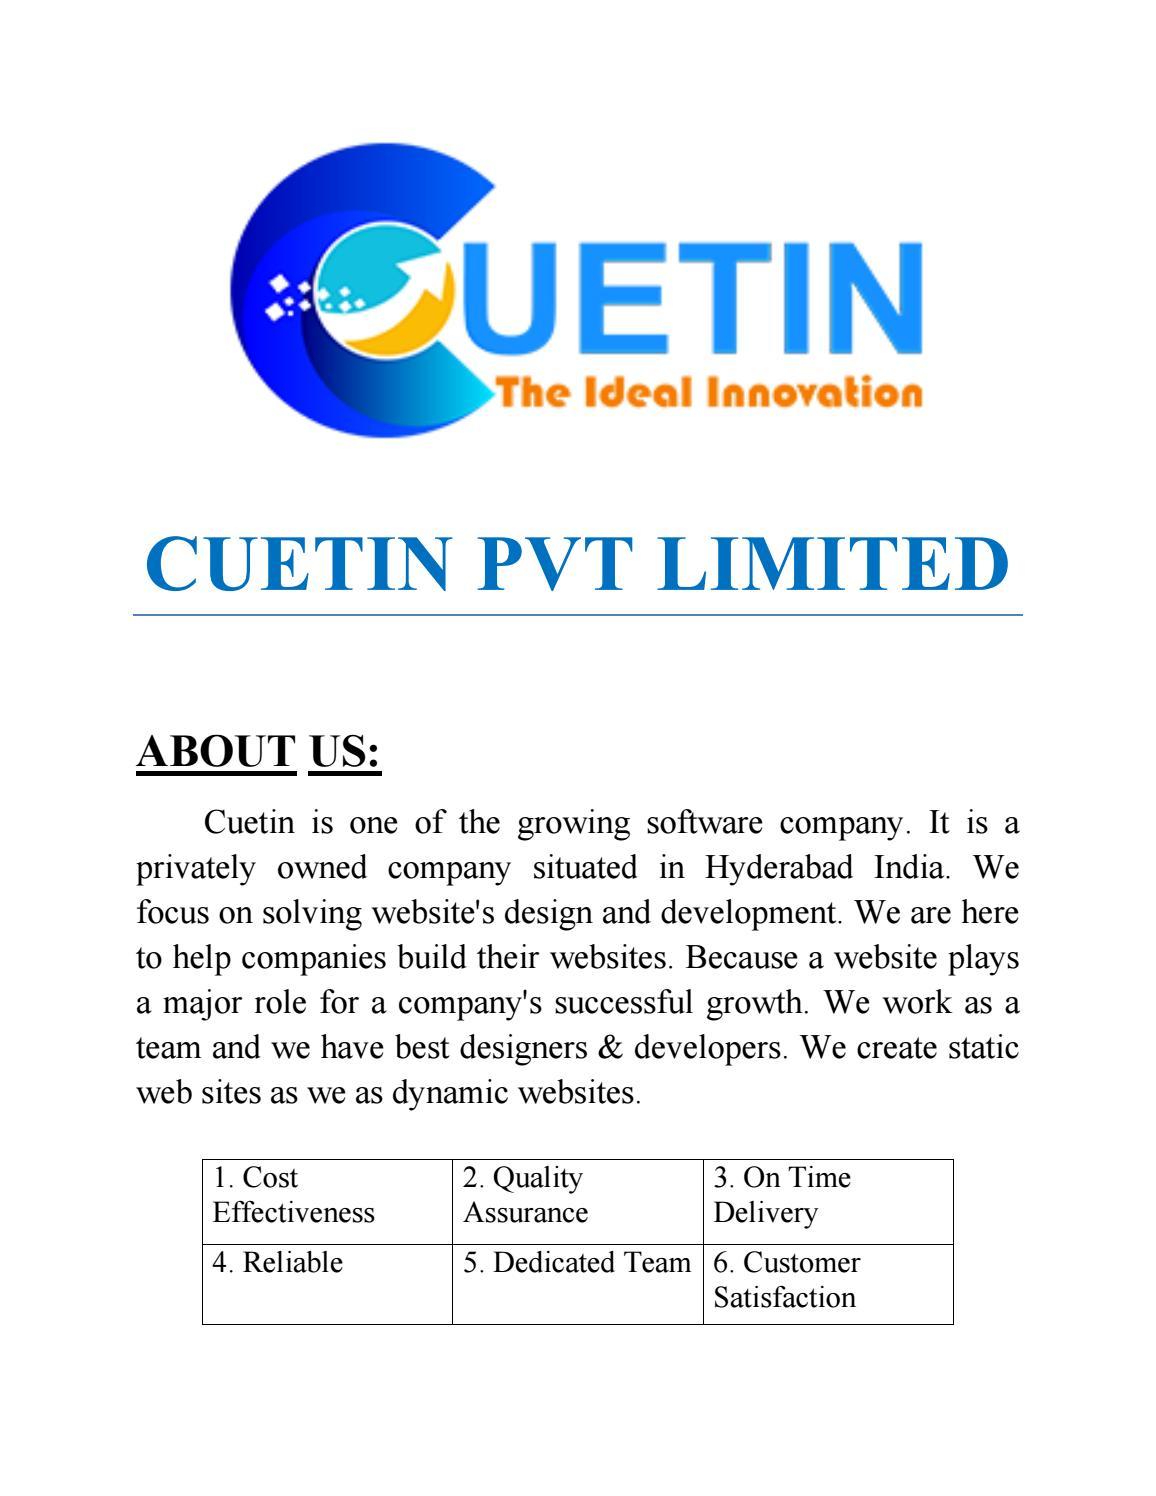 Cuetin Web Design Best Website Design Company In Hyderabad Best E Commerce Website Design Comp By Cuetin2019 Issuu